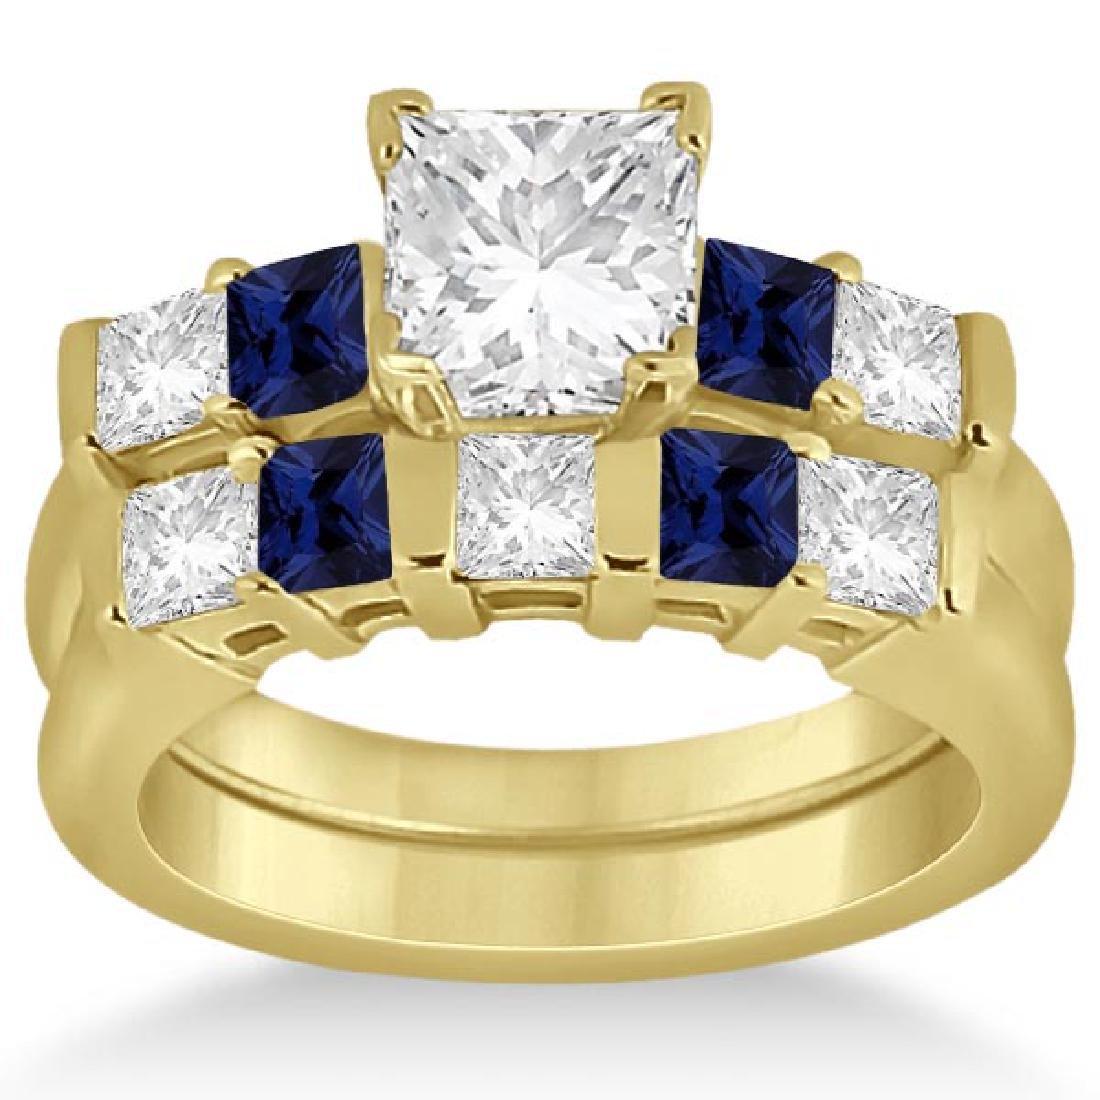 5 Stone Diamond and Blue Sapphire Bridal Set 18k Yellow